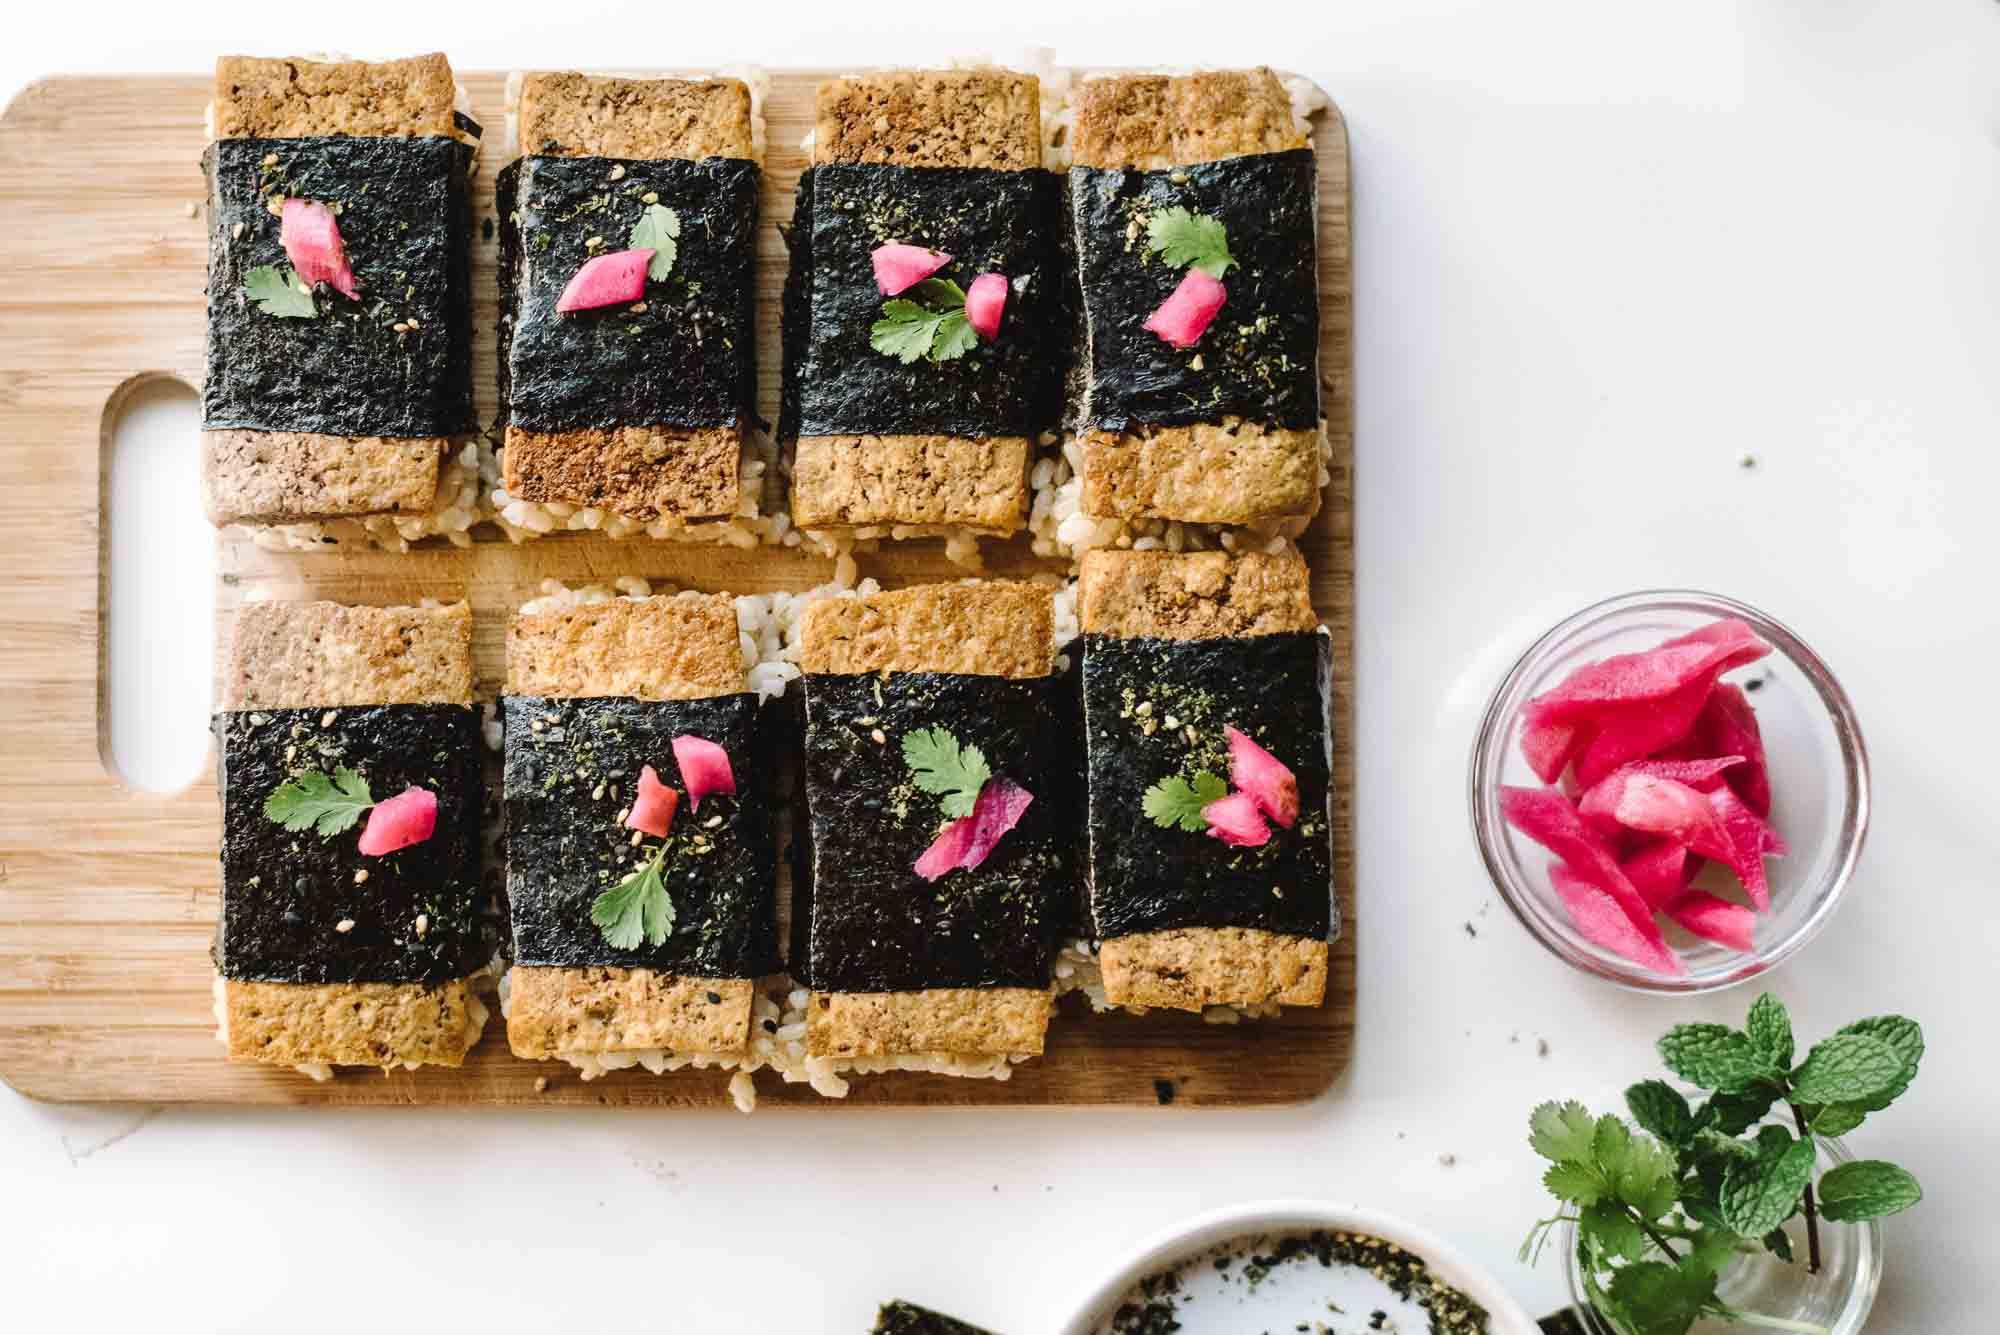 Soy Glazed Tofu Musubi From Aloha Kitchen By Alana Kysar Kale Caramel